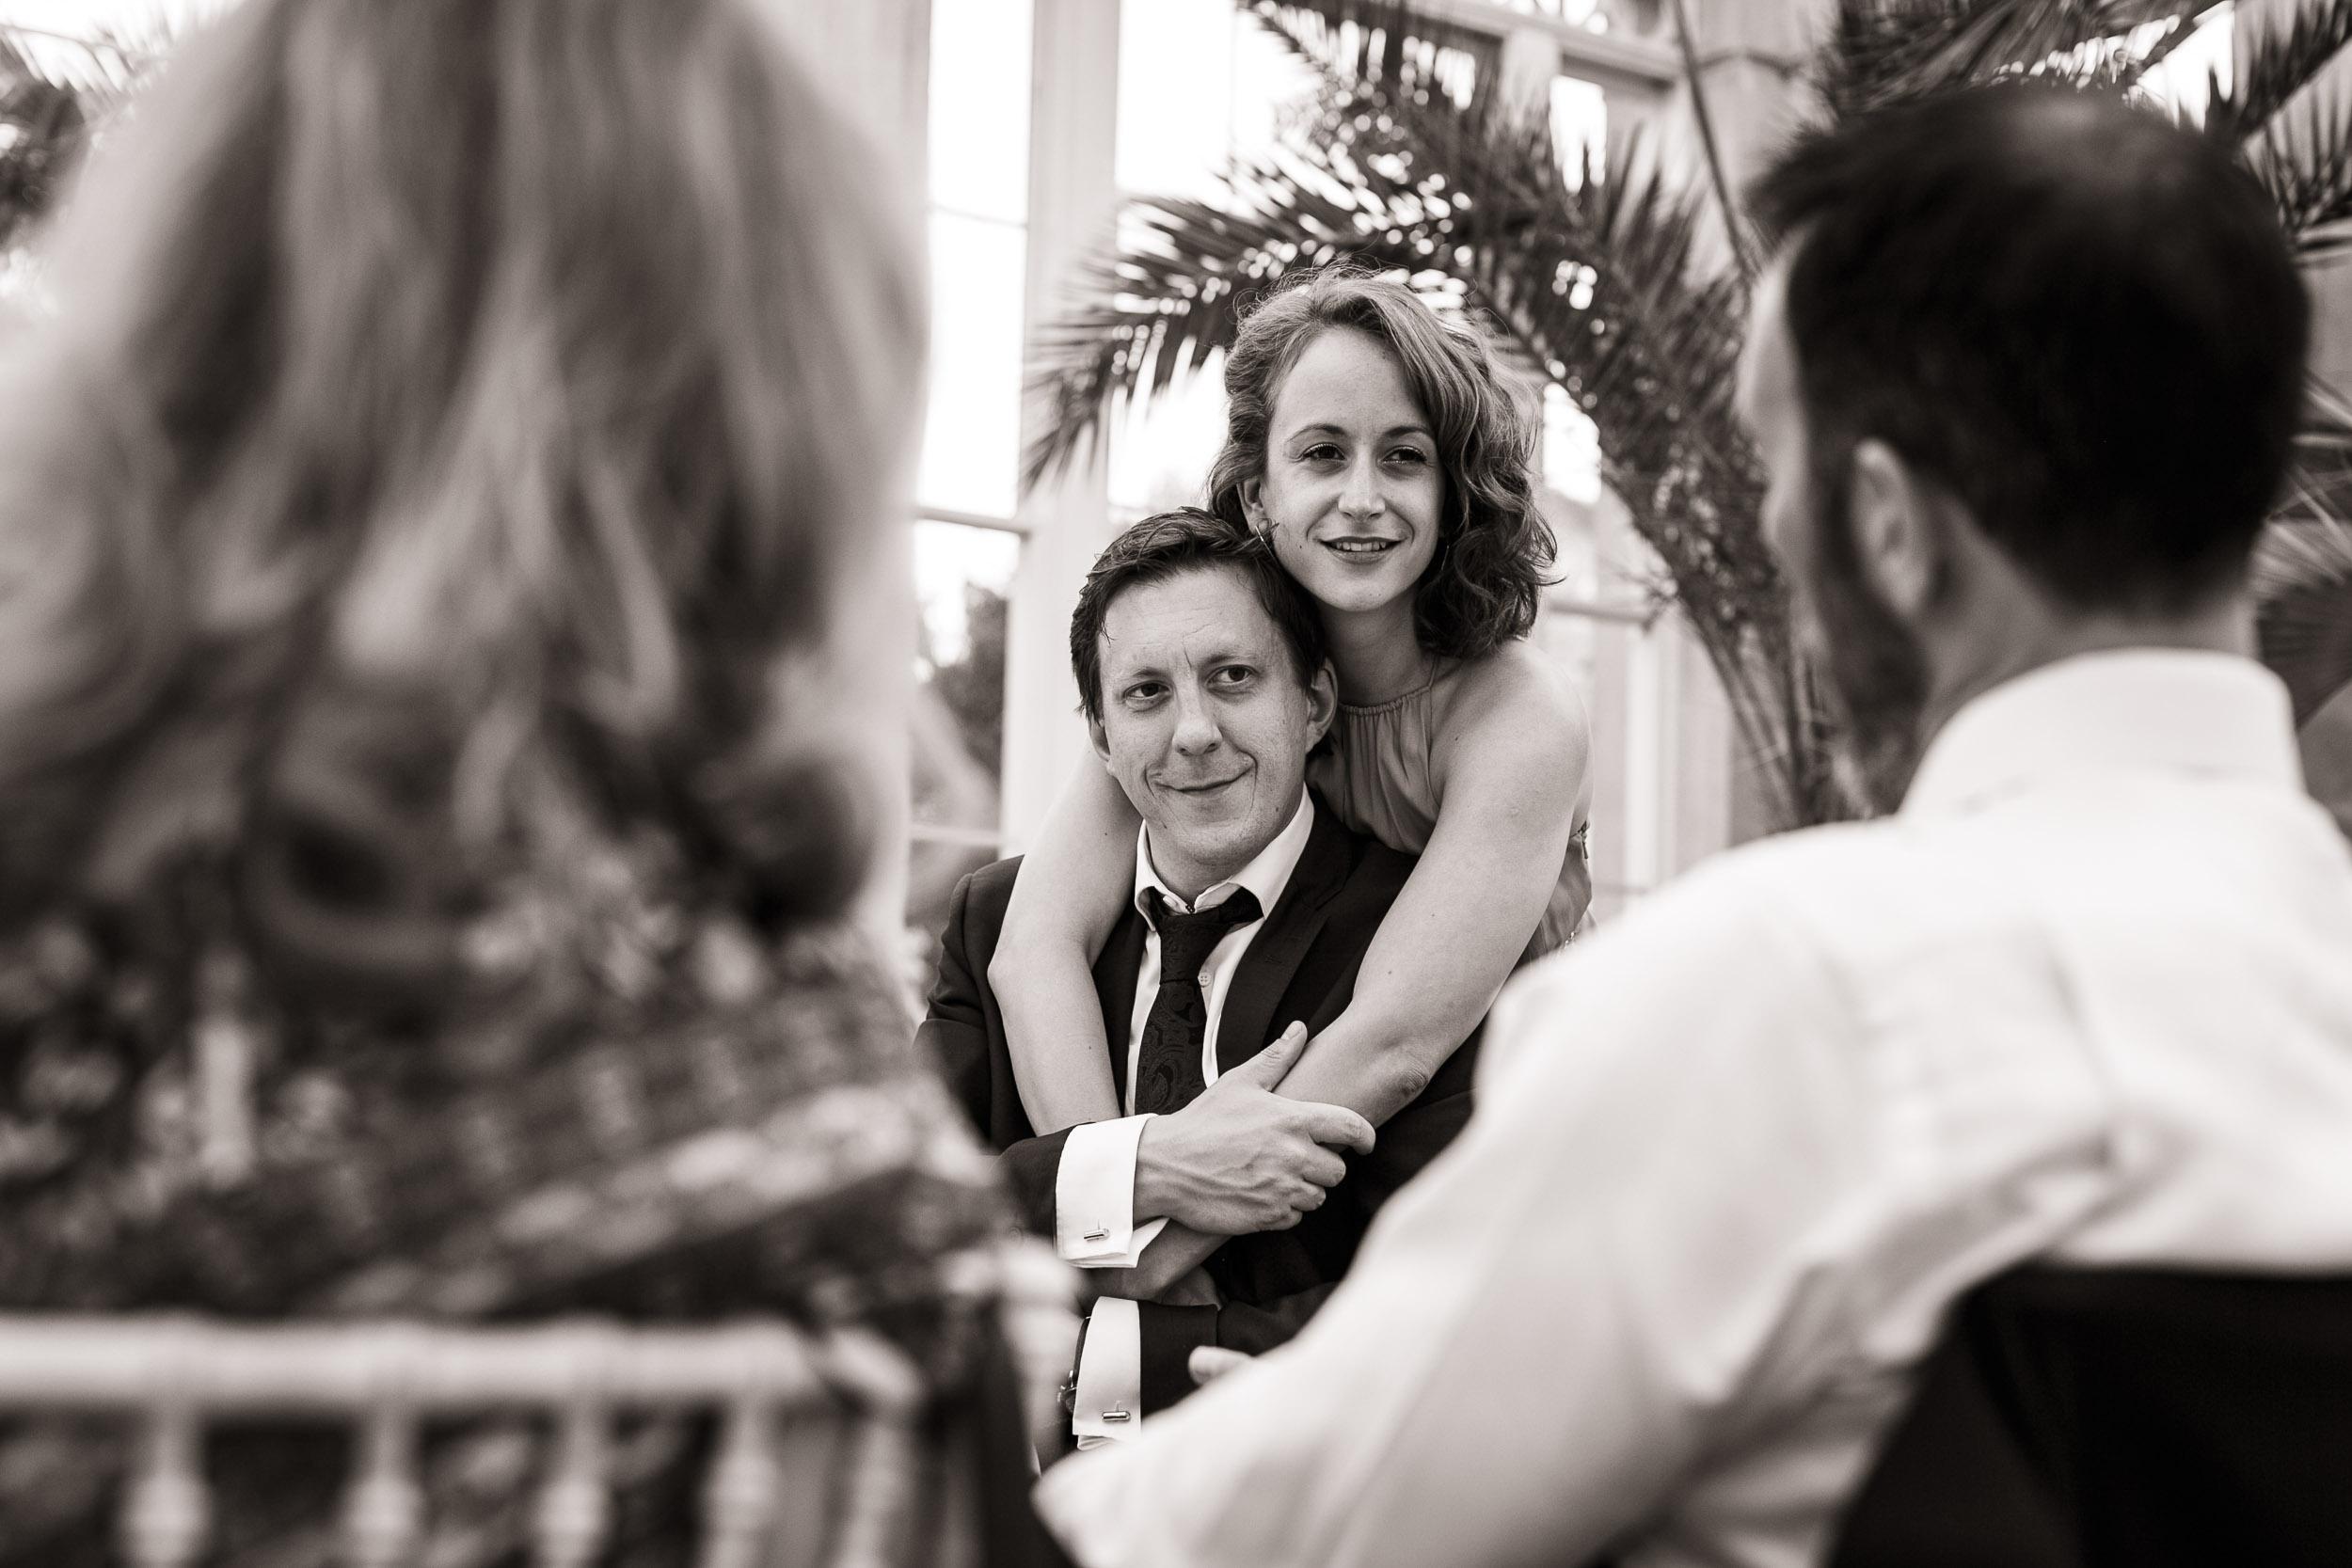 syon-house-wedding-photographer-london 140.jpg